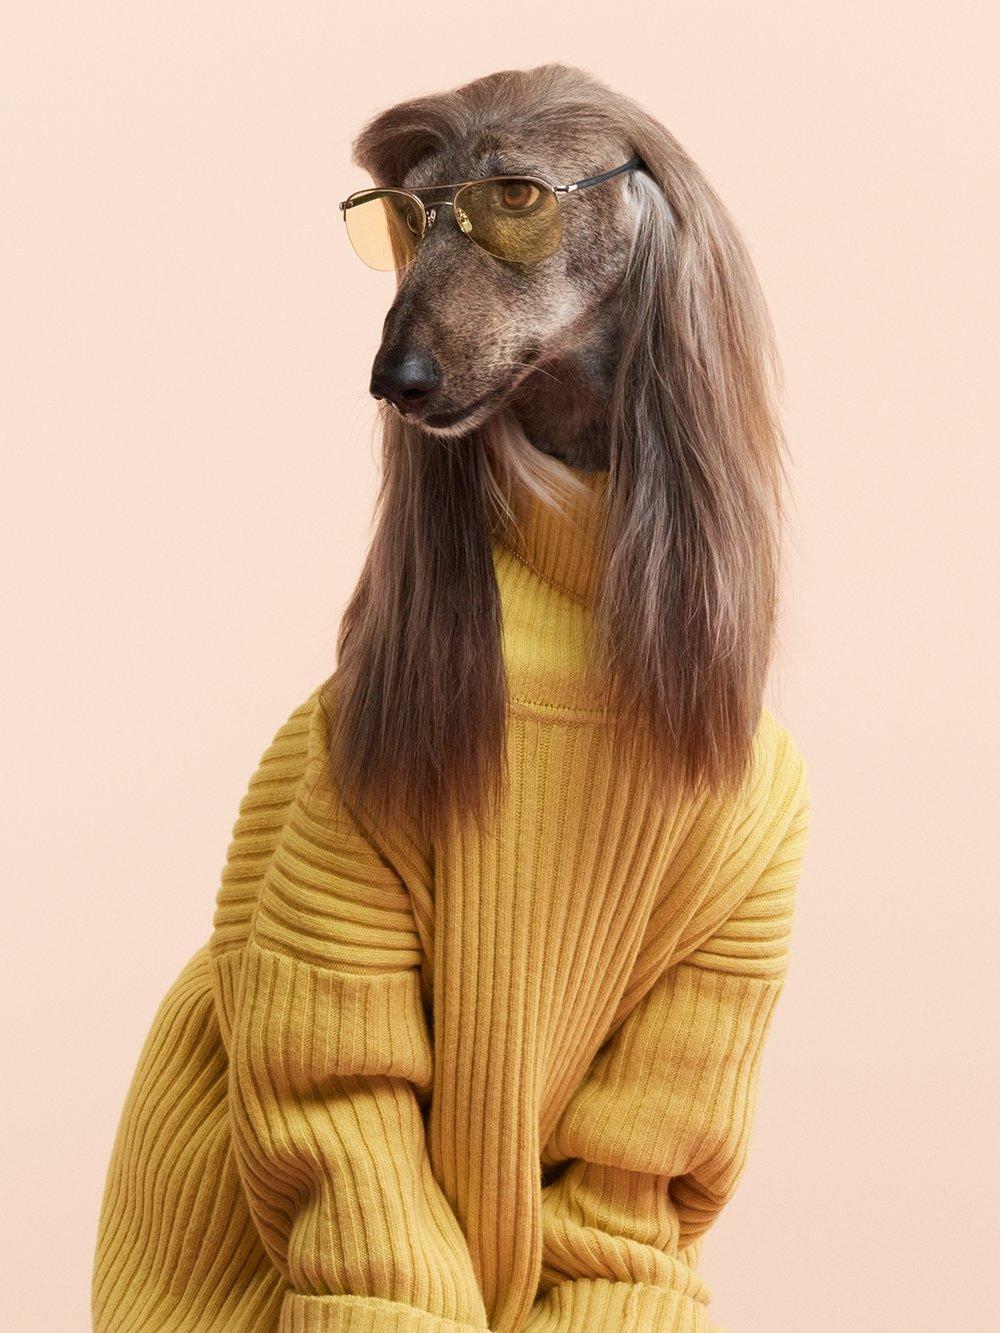 08-Canine.jpg